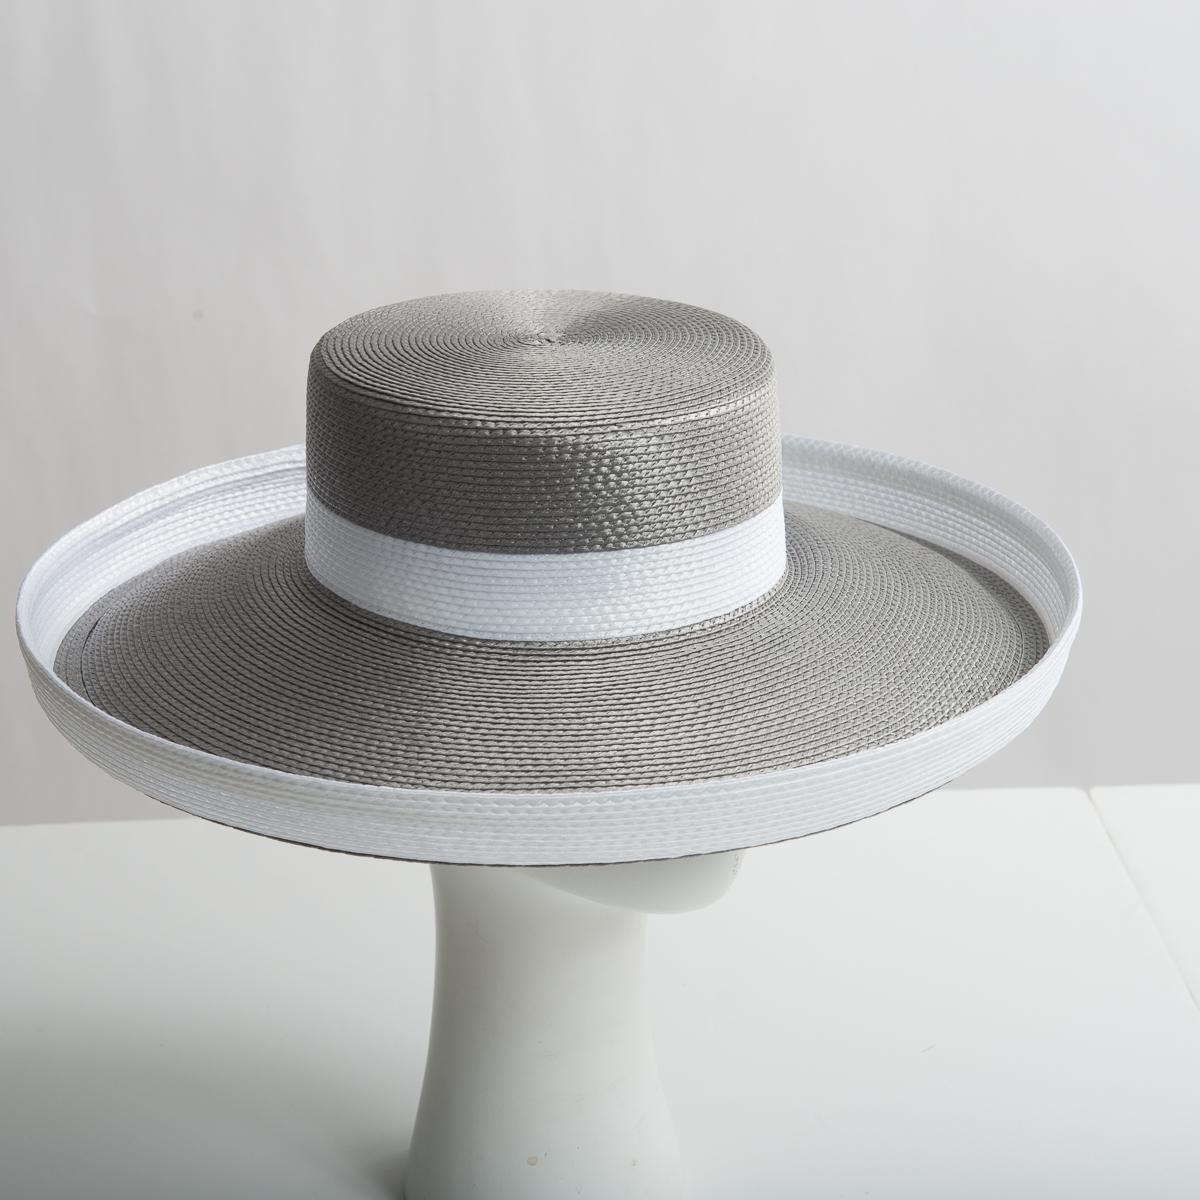 2b2ef7f7a0201c Grey - White Polypropylene Straw Medium Brim Plain Hats-WN0183R-0-07.01- Sun  Yorkos | Zoria